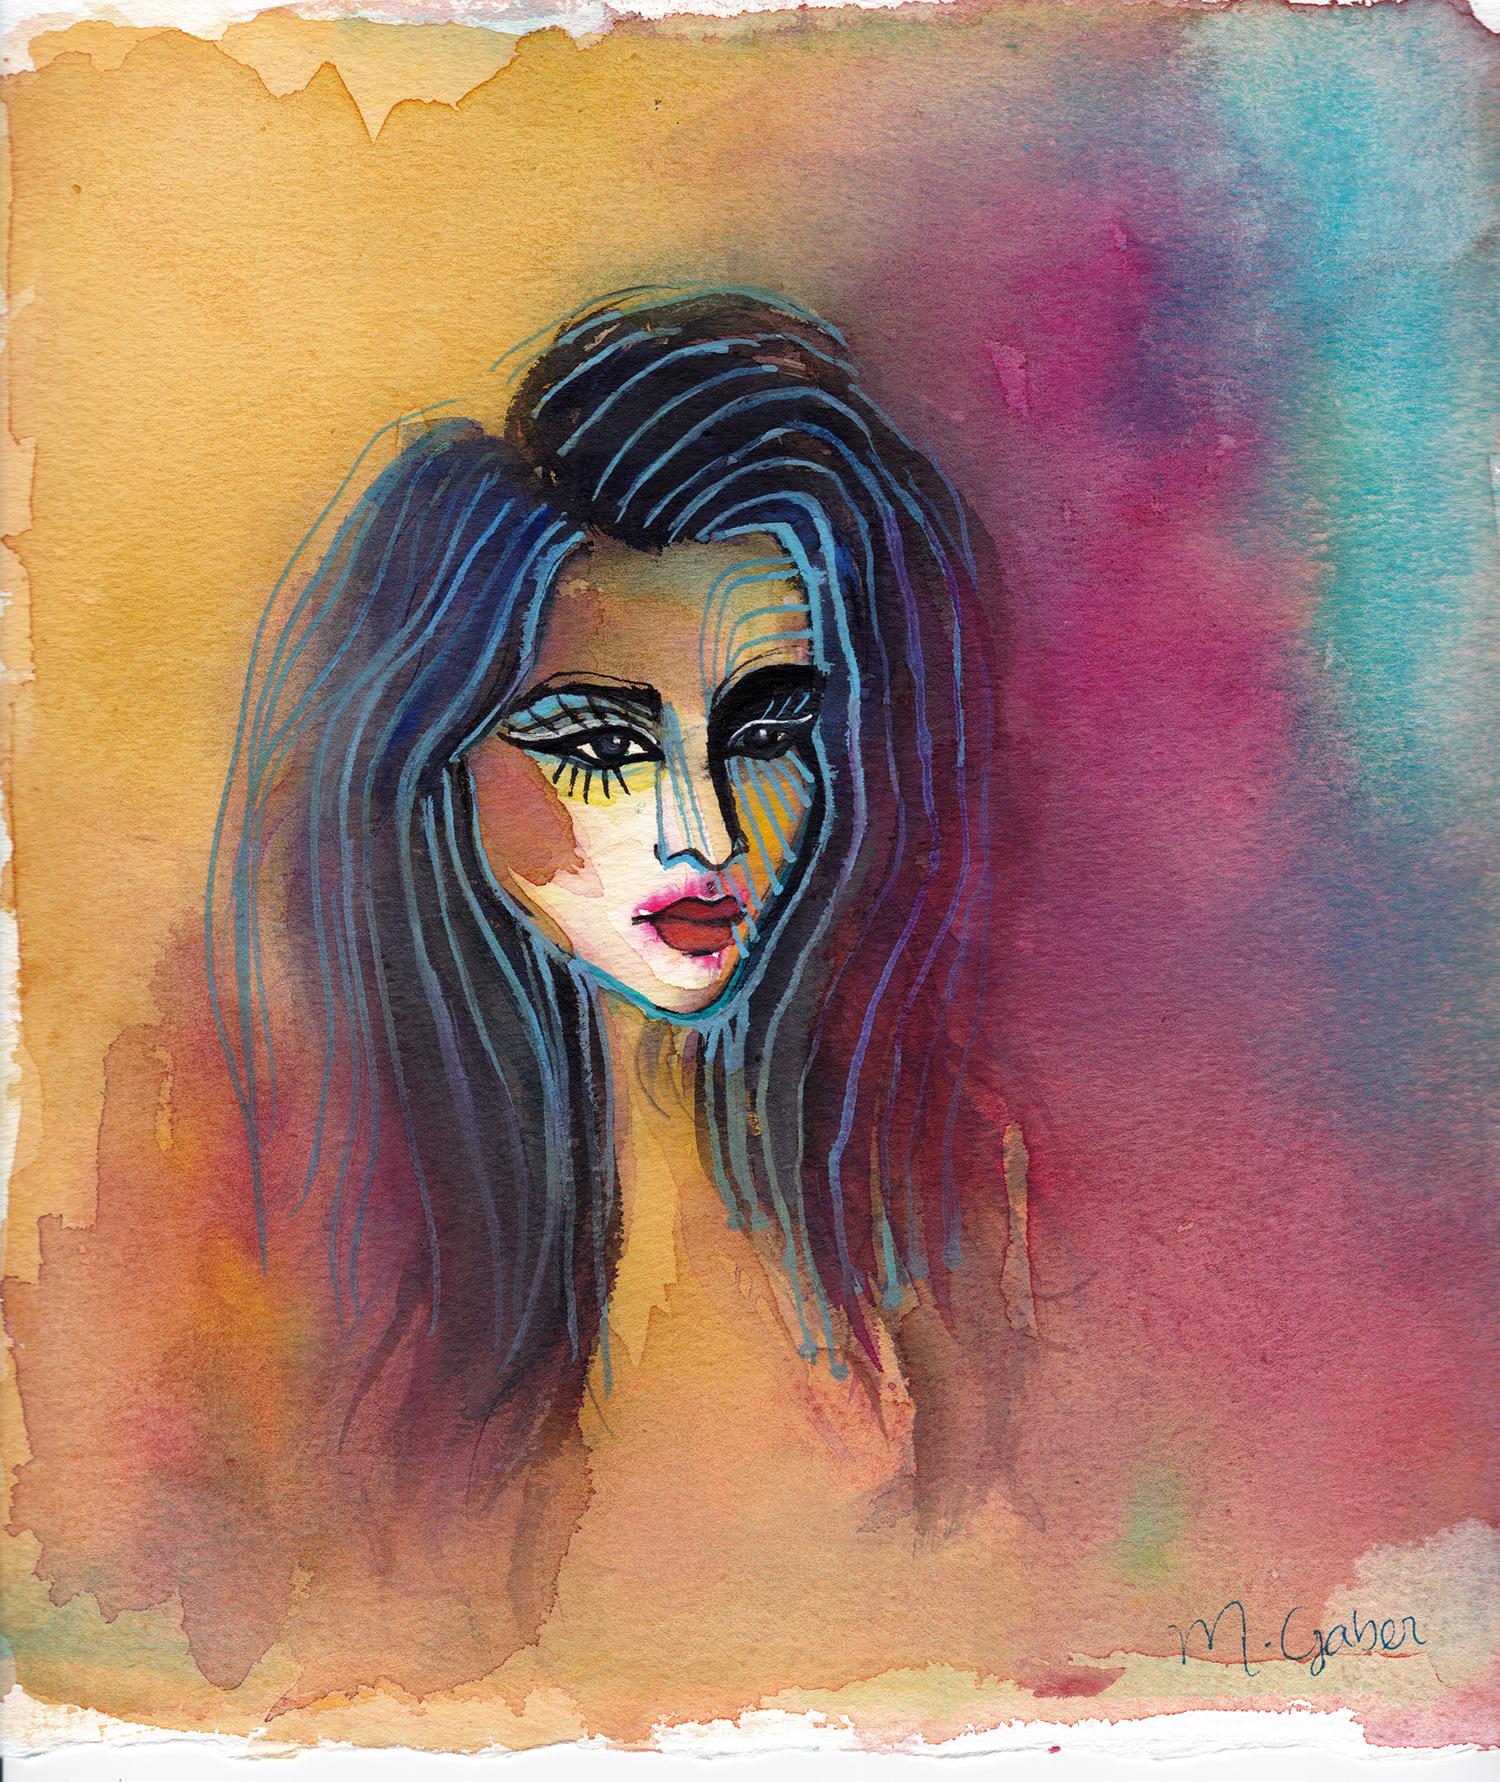 Maryam Gaber-Portrait-Watercolor-Queen-colorlover--2016 5-1500.jpg